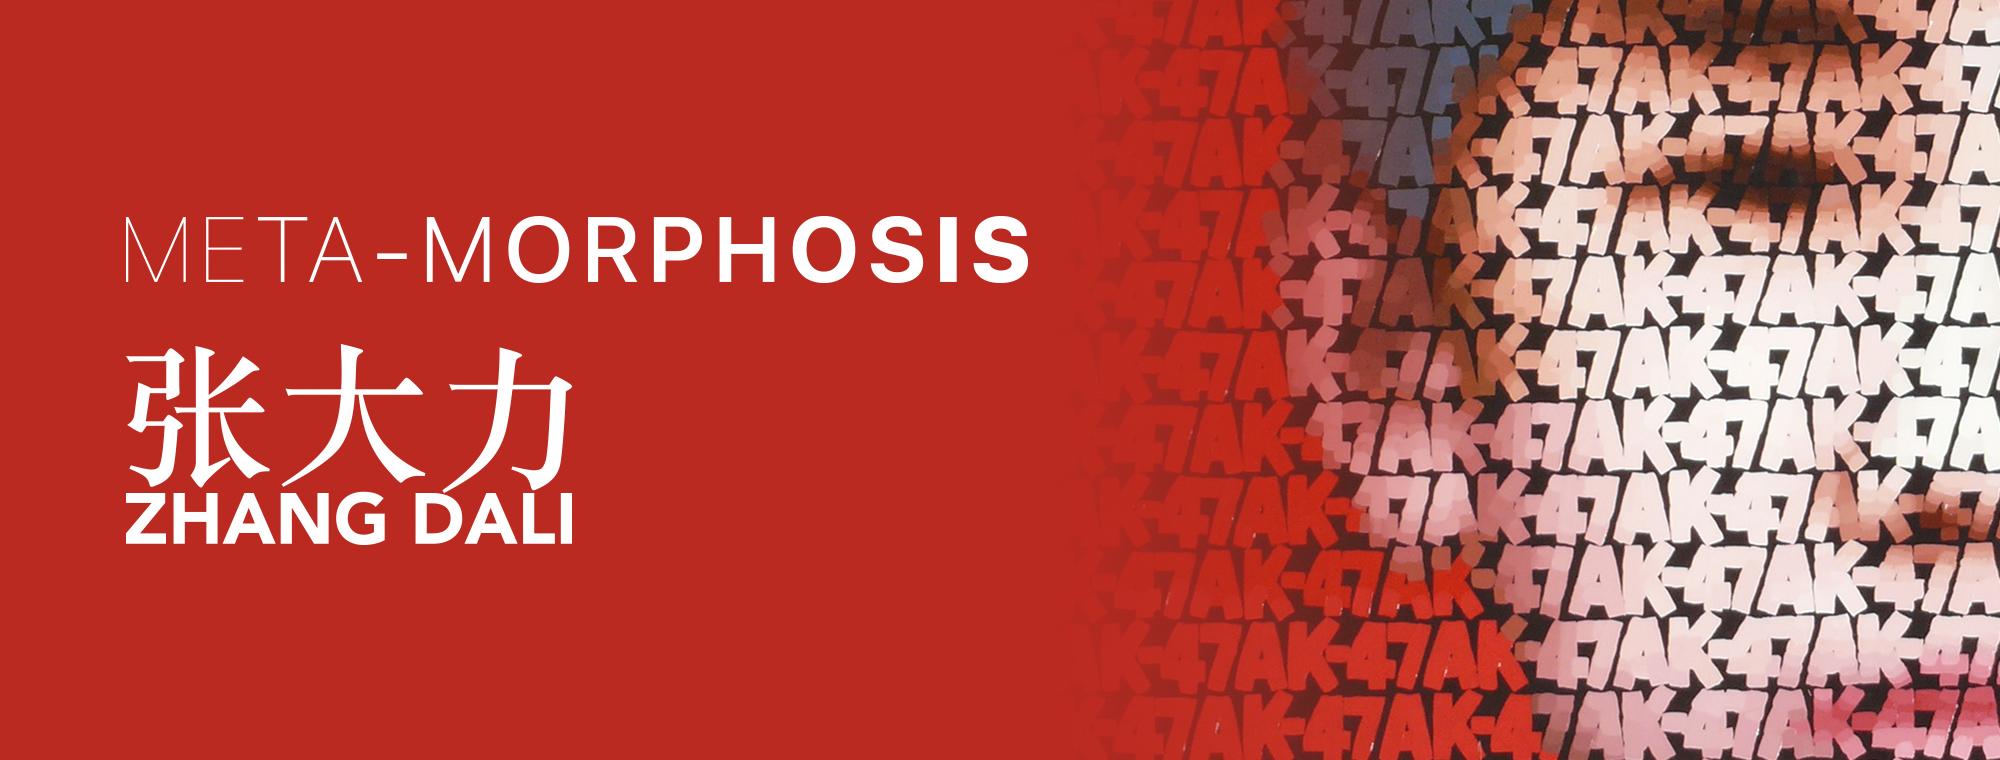 META-MORPHOSIS – ZHANG DALI